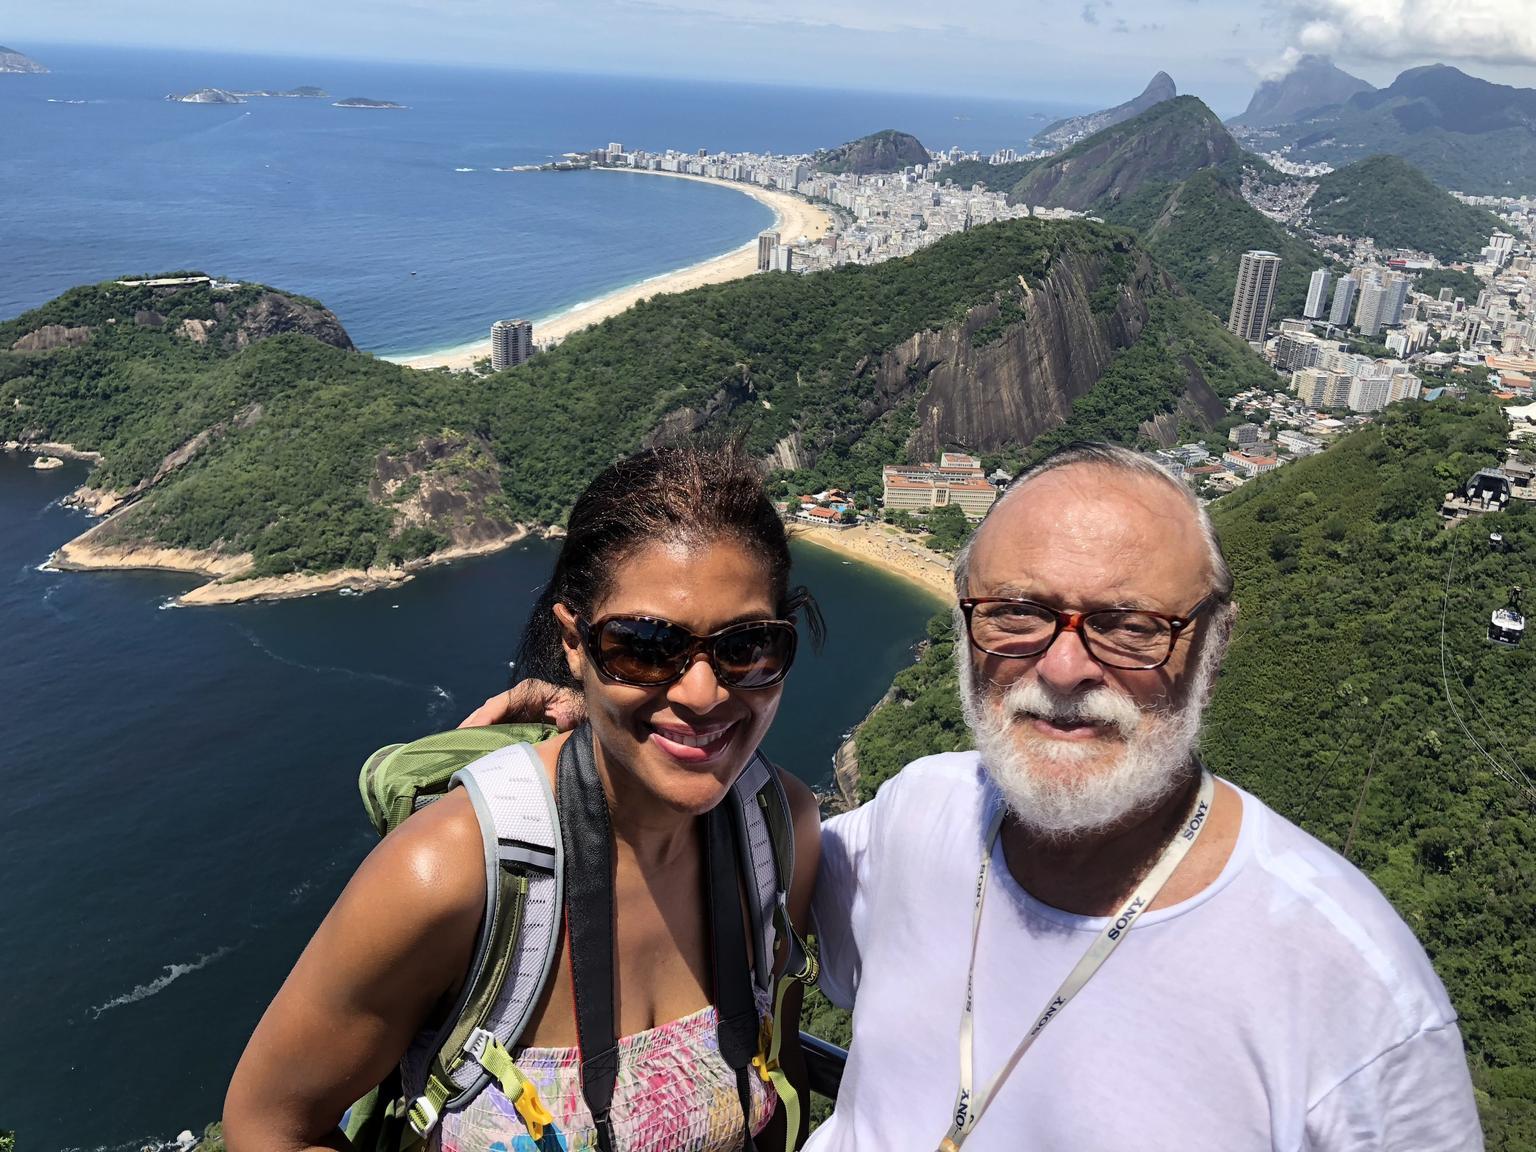 MORE PHOTOS, The best of Rio de Janeiro in private service